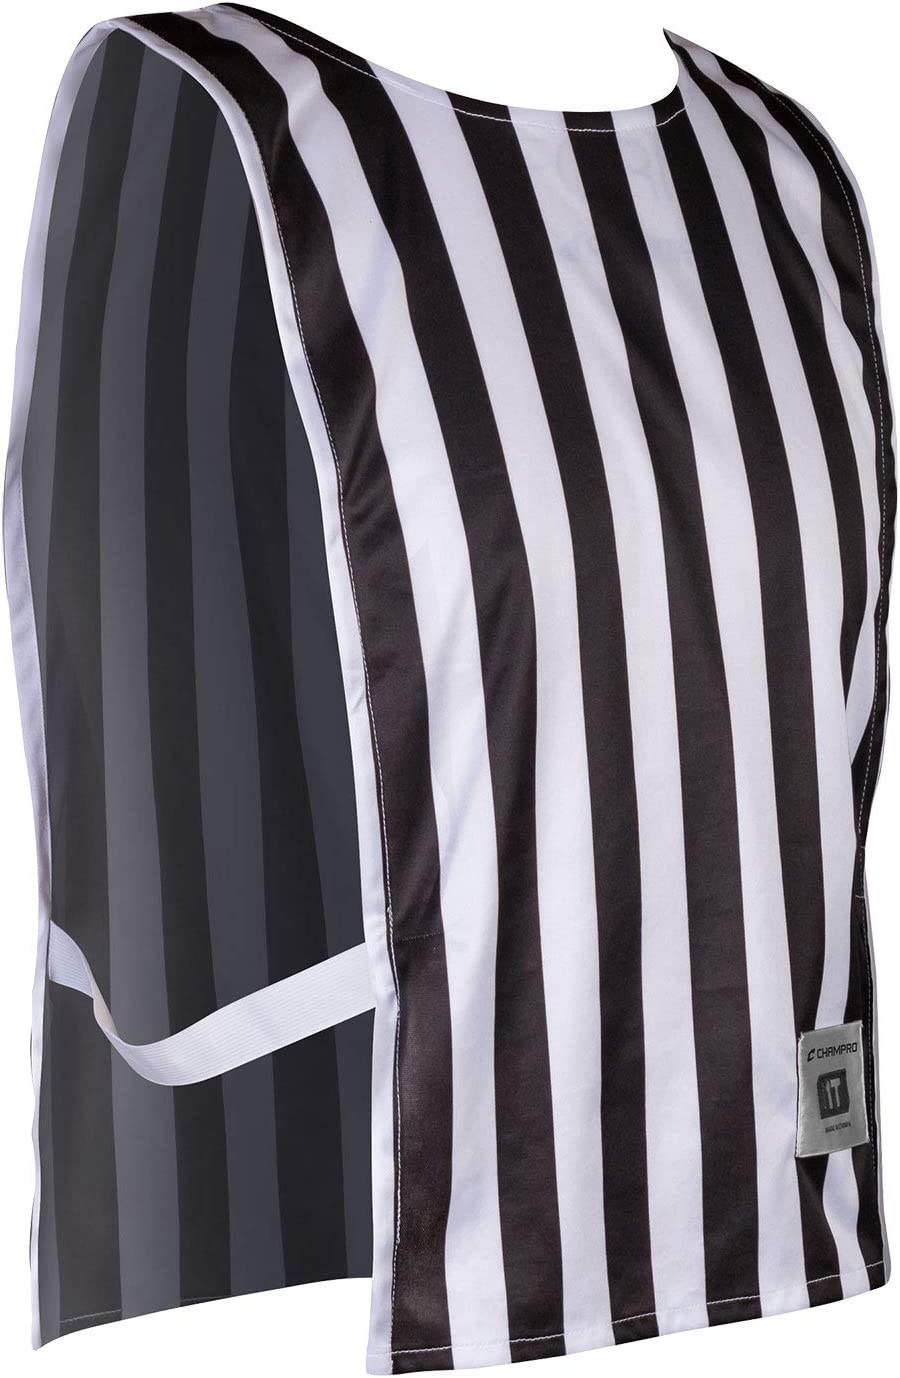 Champro Referee Pinnie